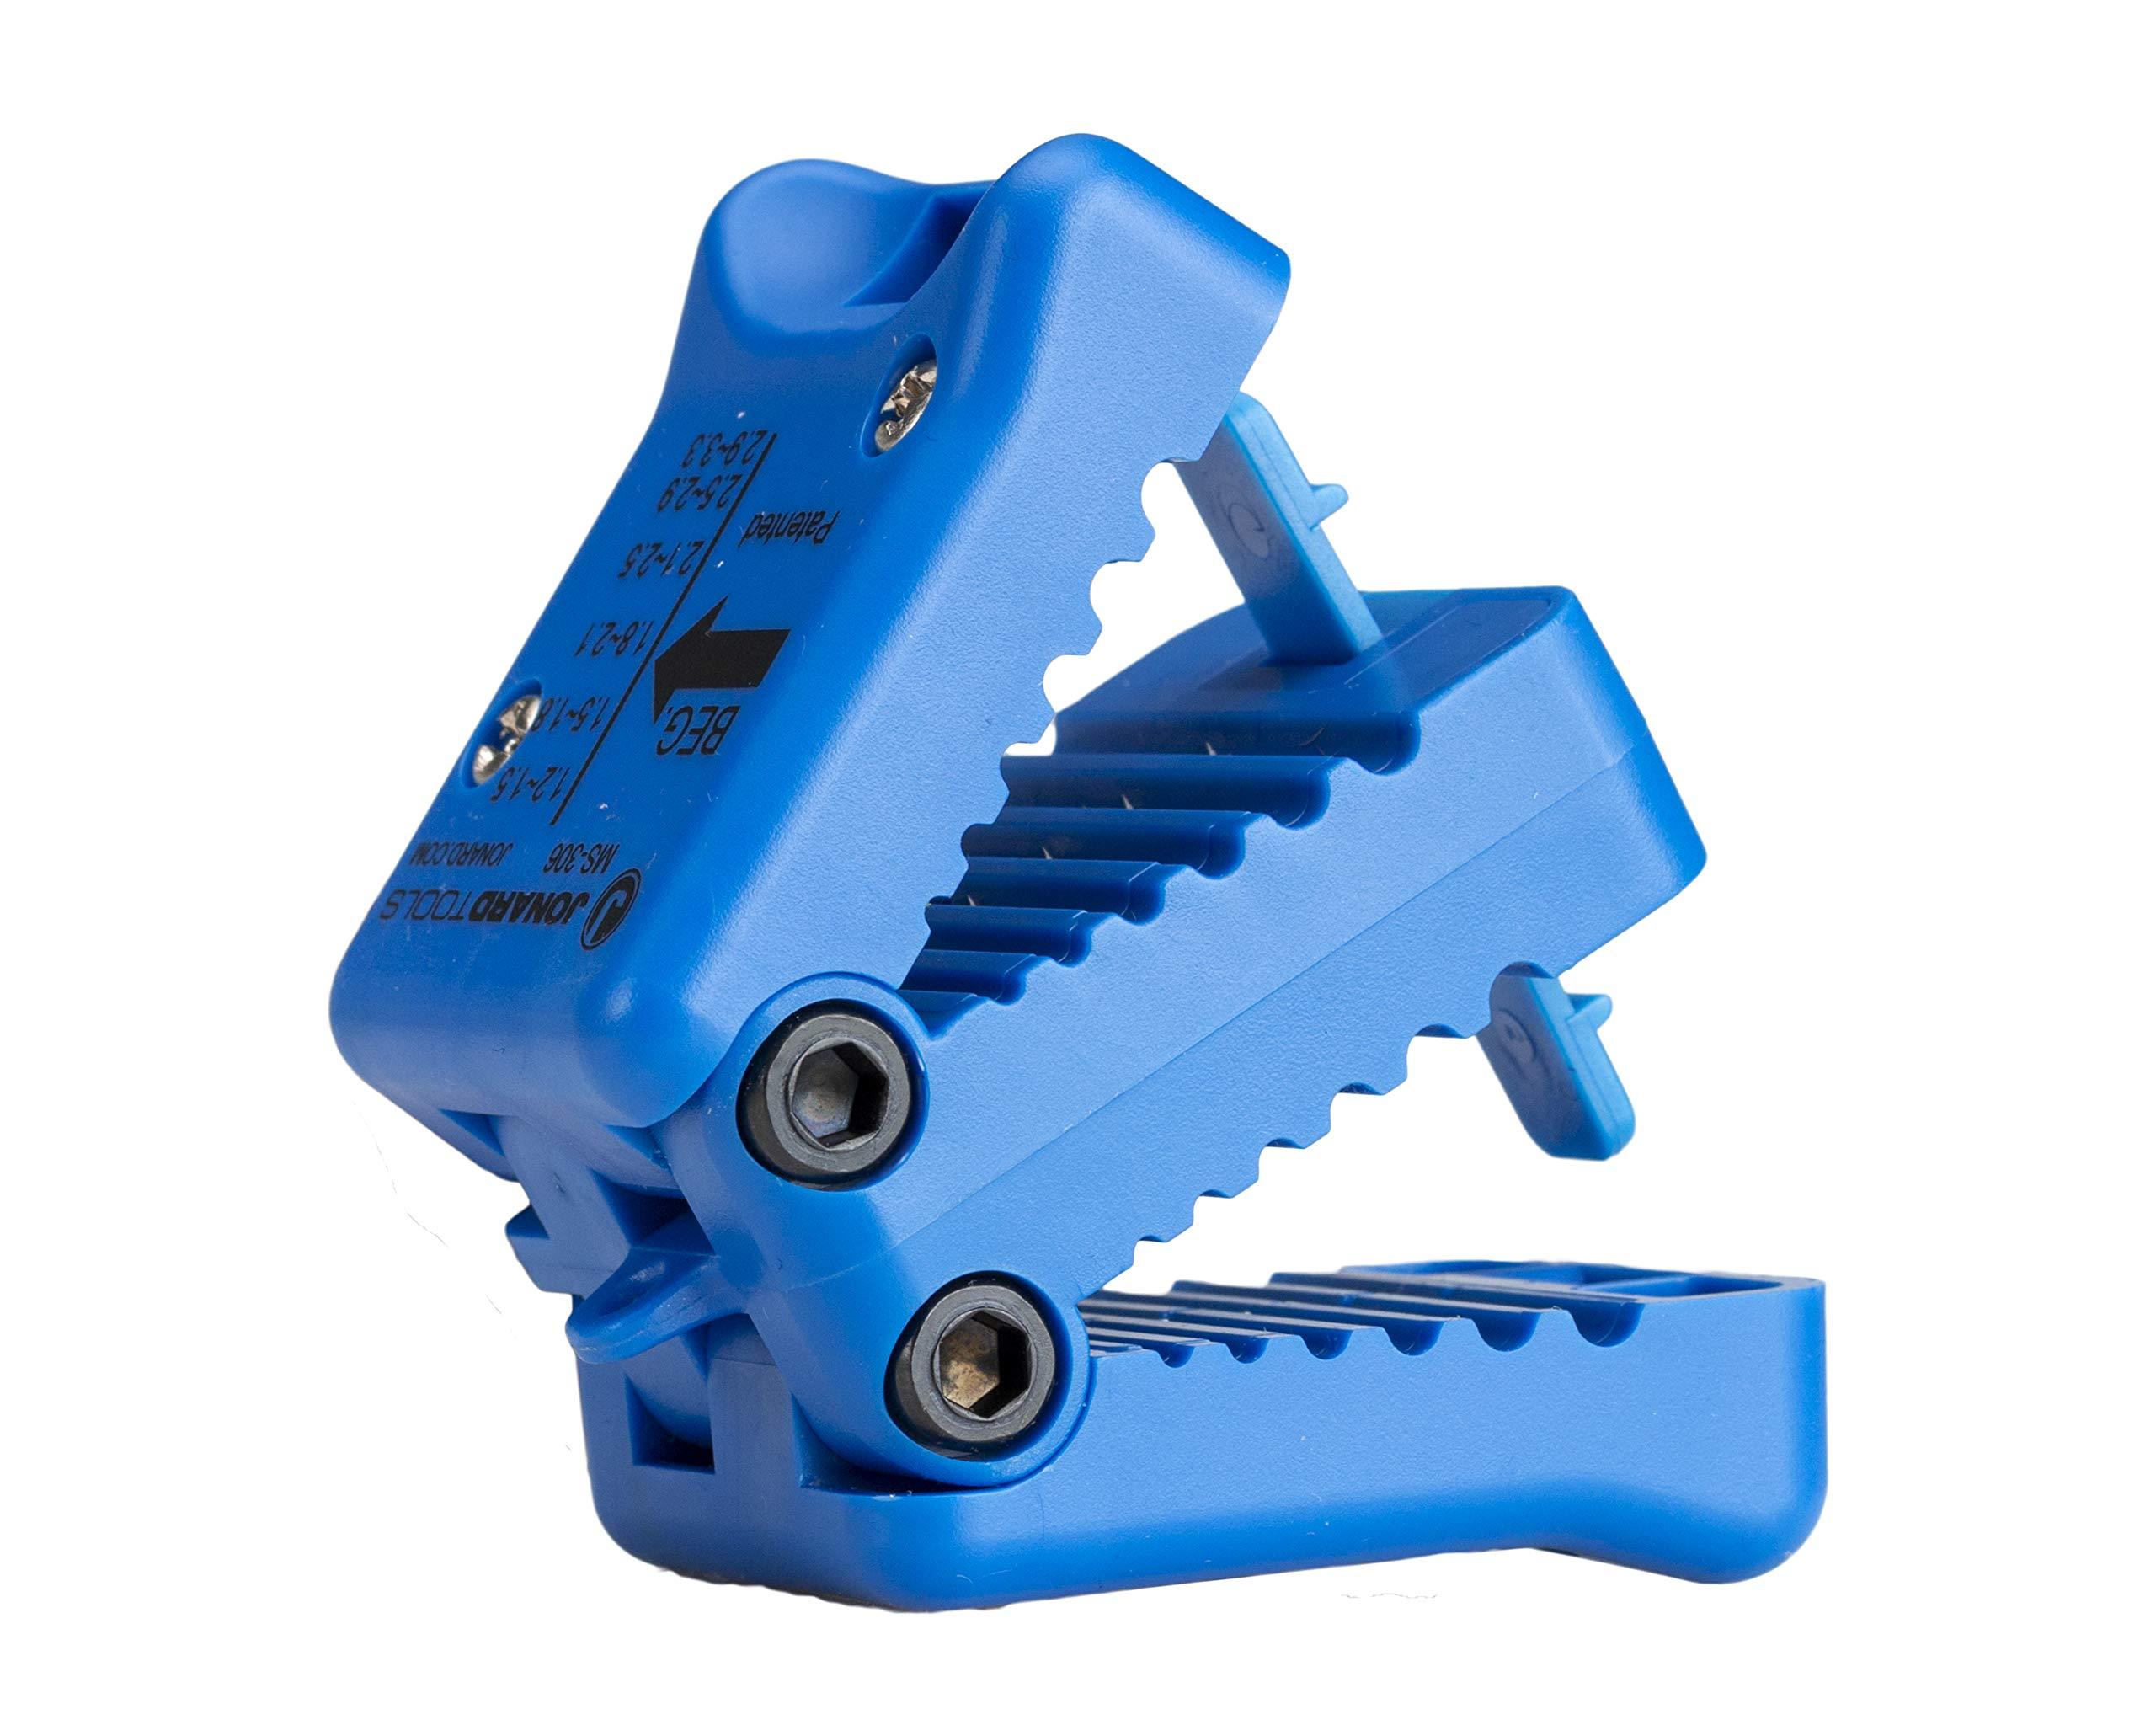 Jonard Tools MS-306 Fiber Optic Cable Mid Span Slit & Ring Tool (1.2 mm - 3.3 mm)